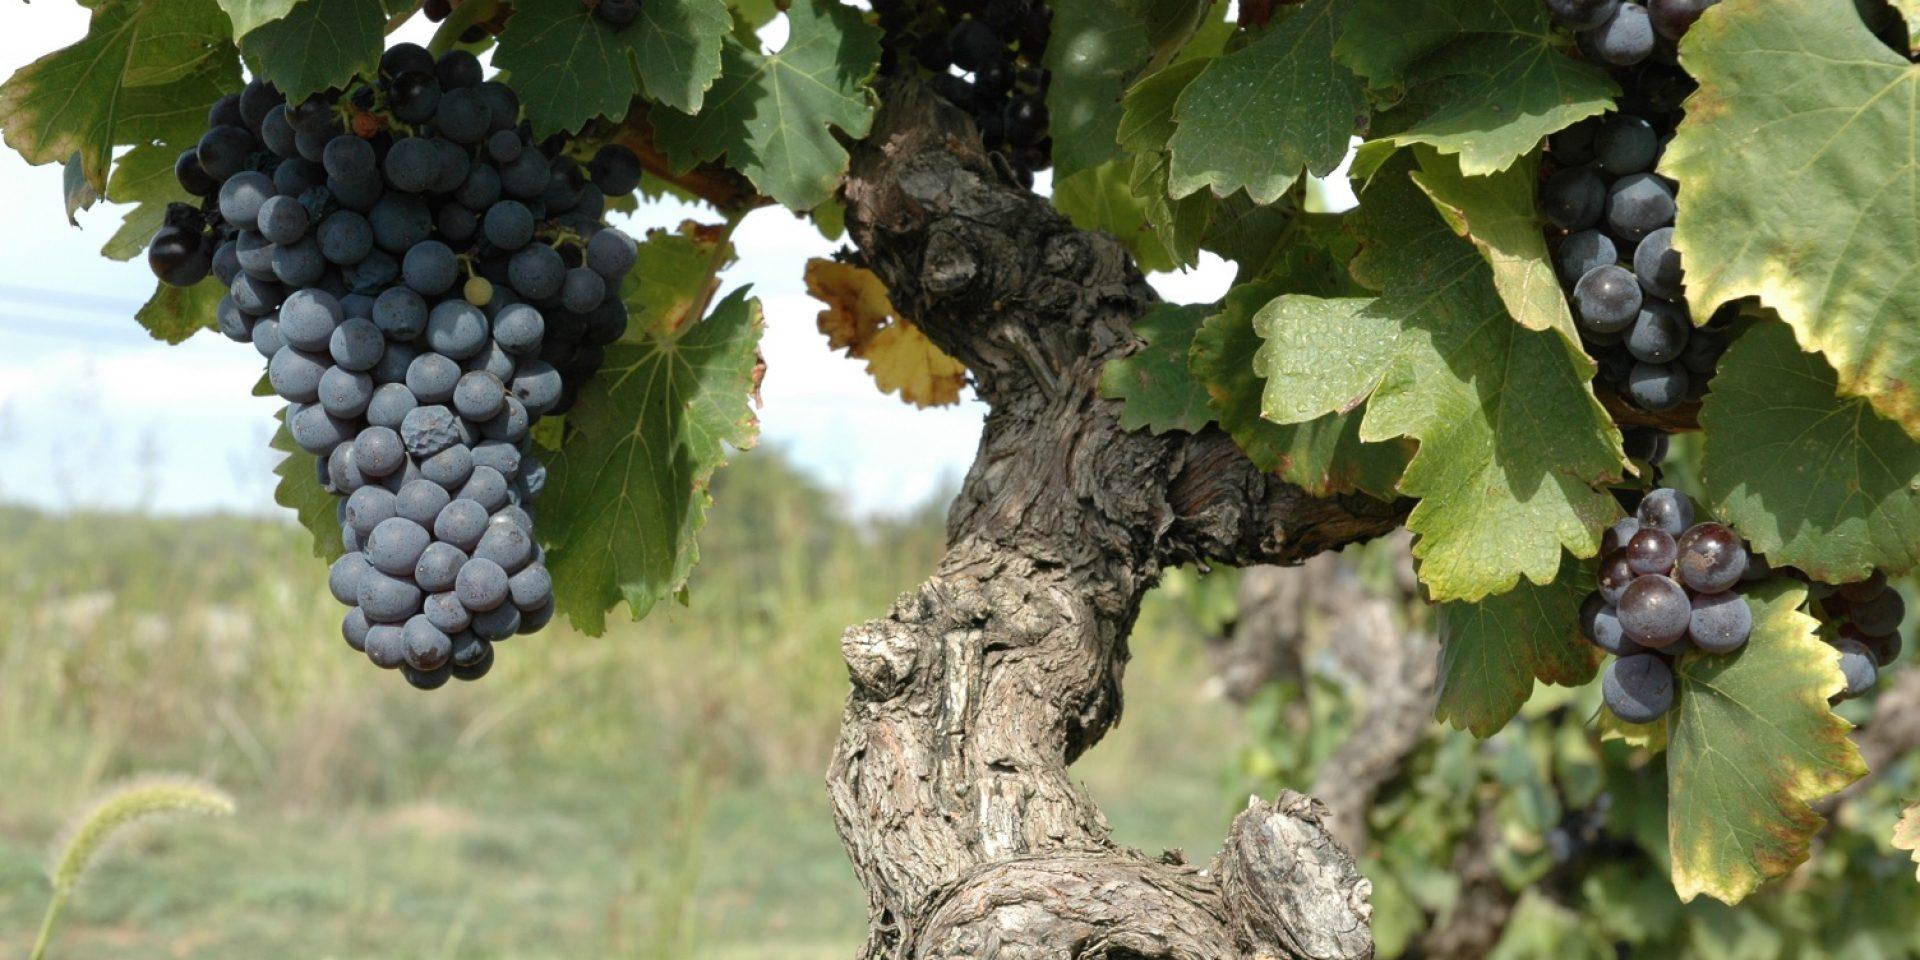 Un vignoble de Costières-de-Nîmes